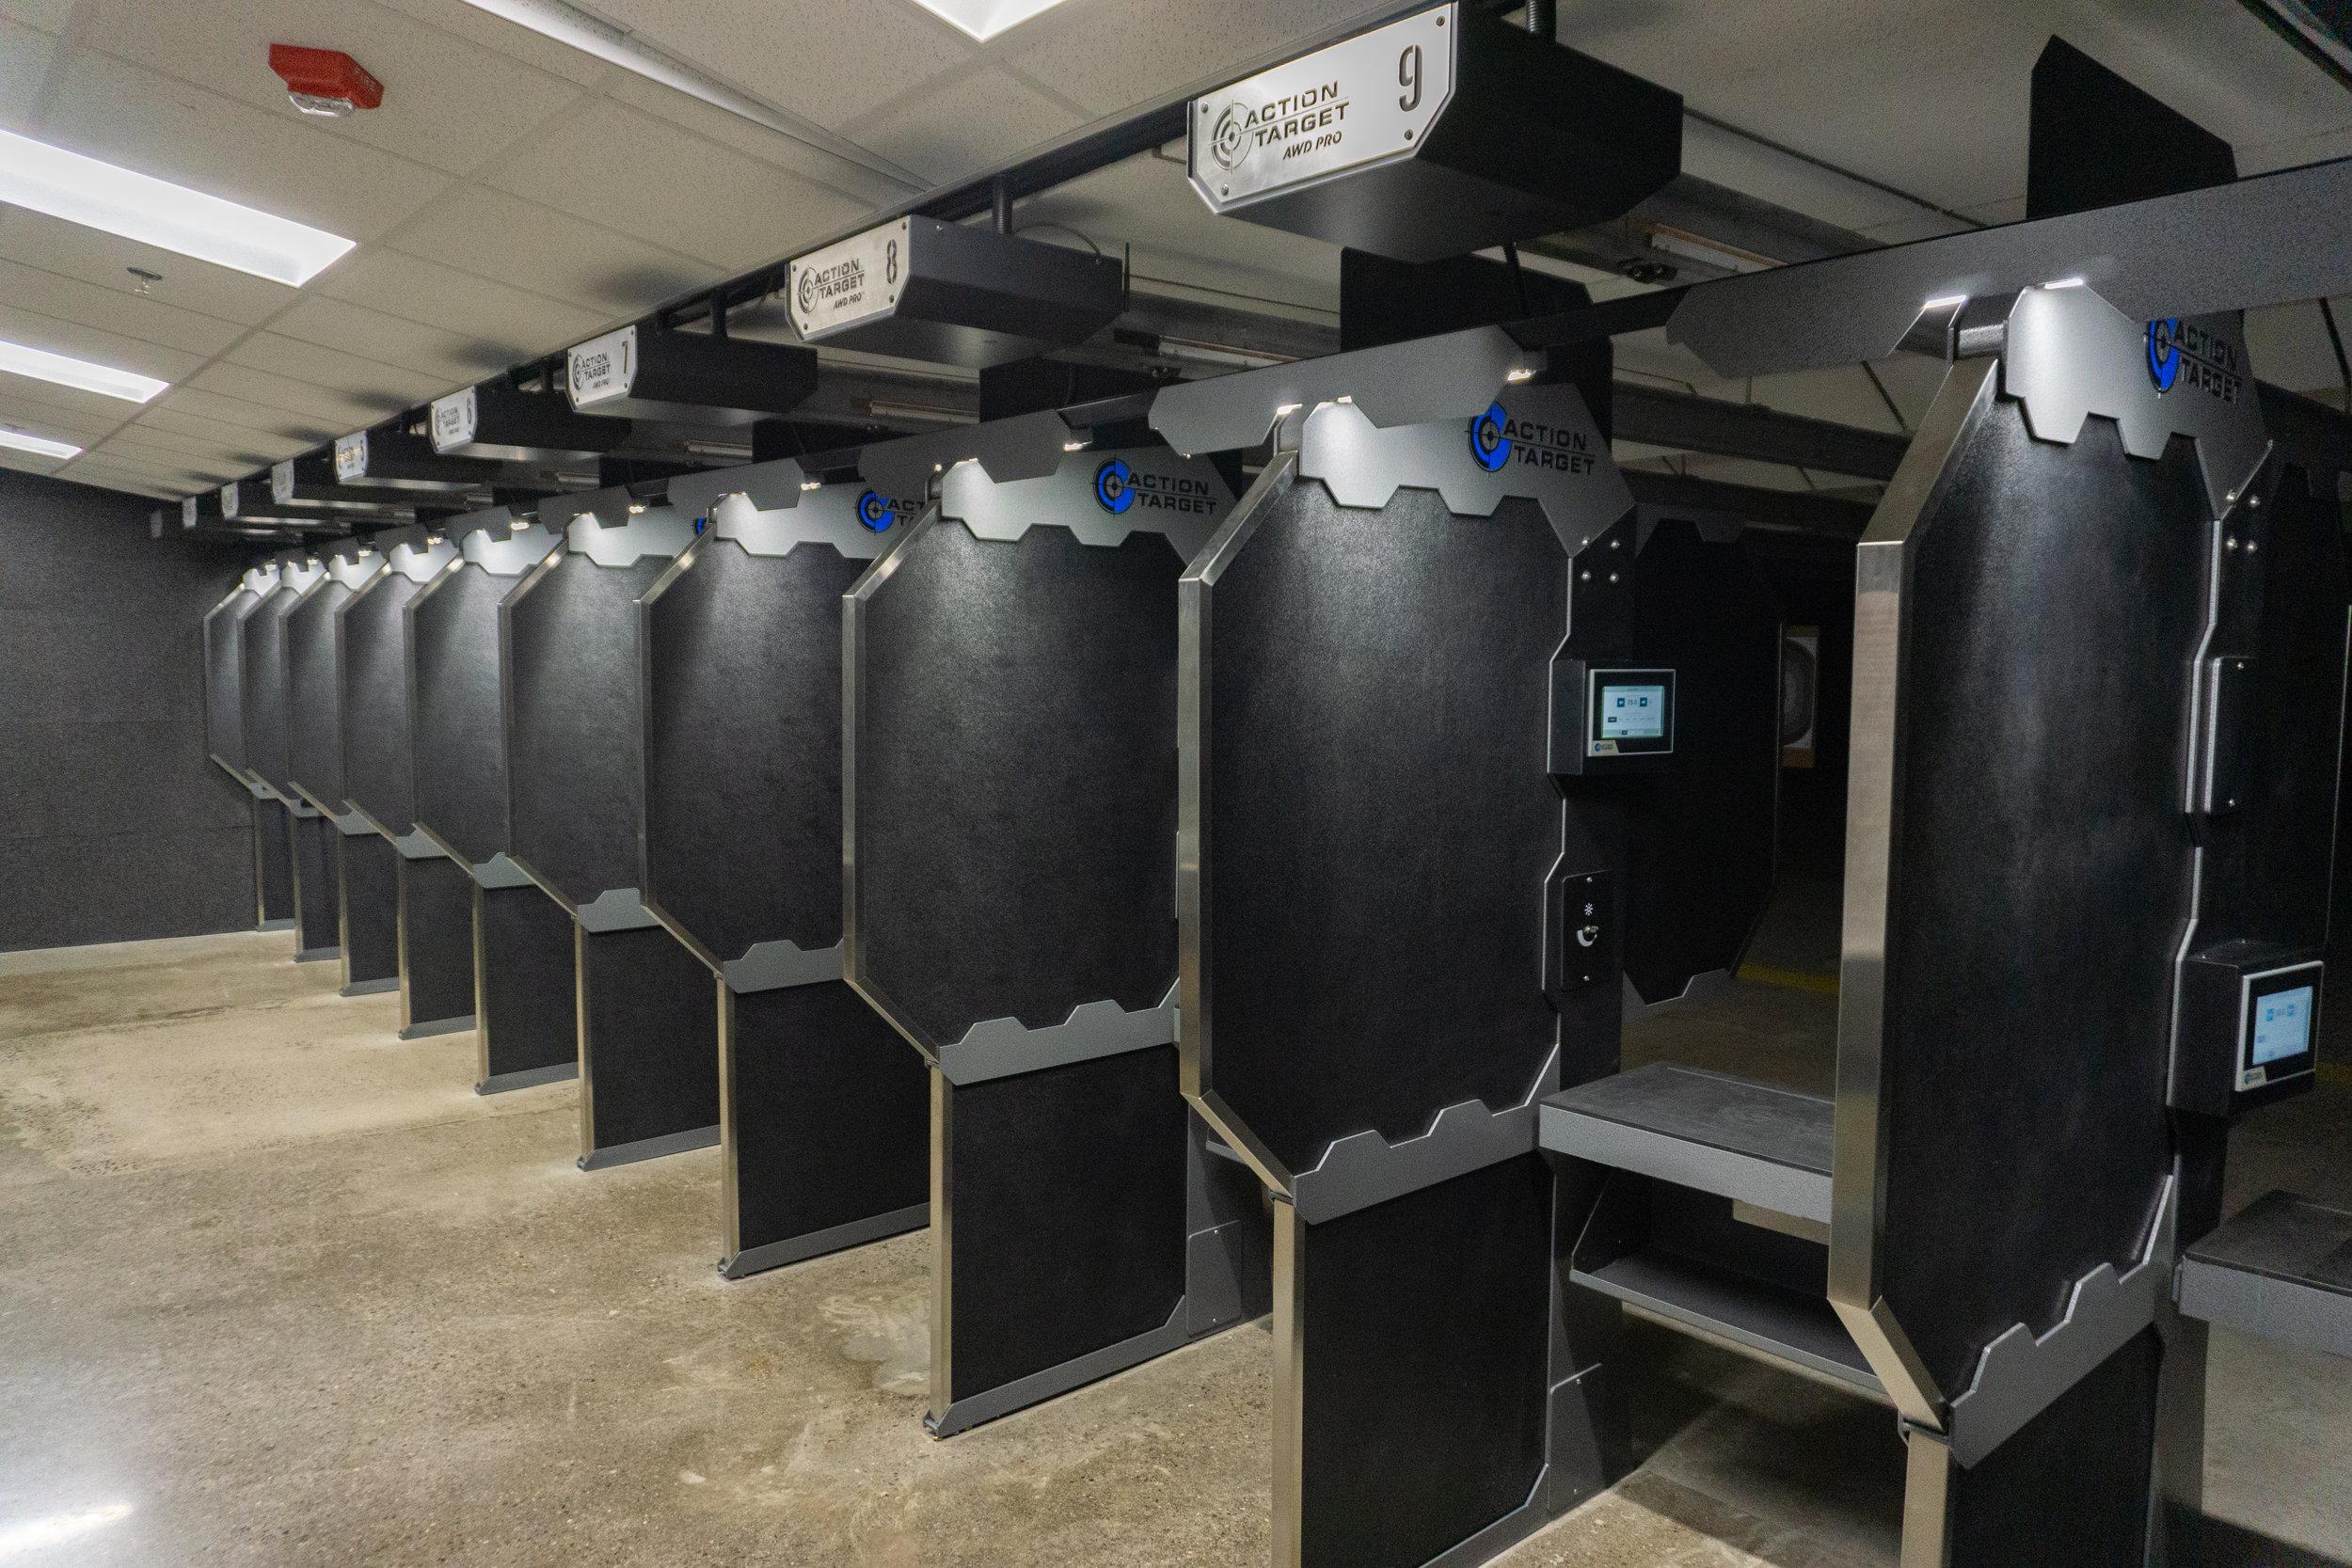 Shooting Range in West Springfield, MA